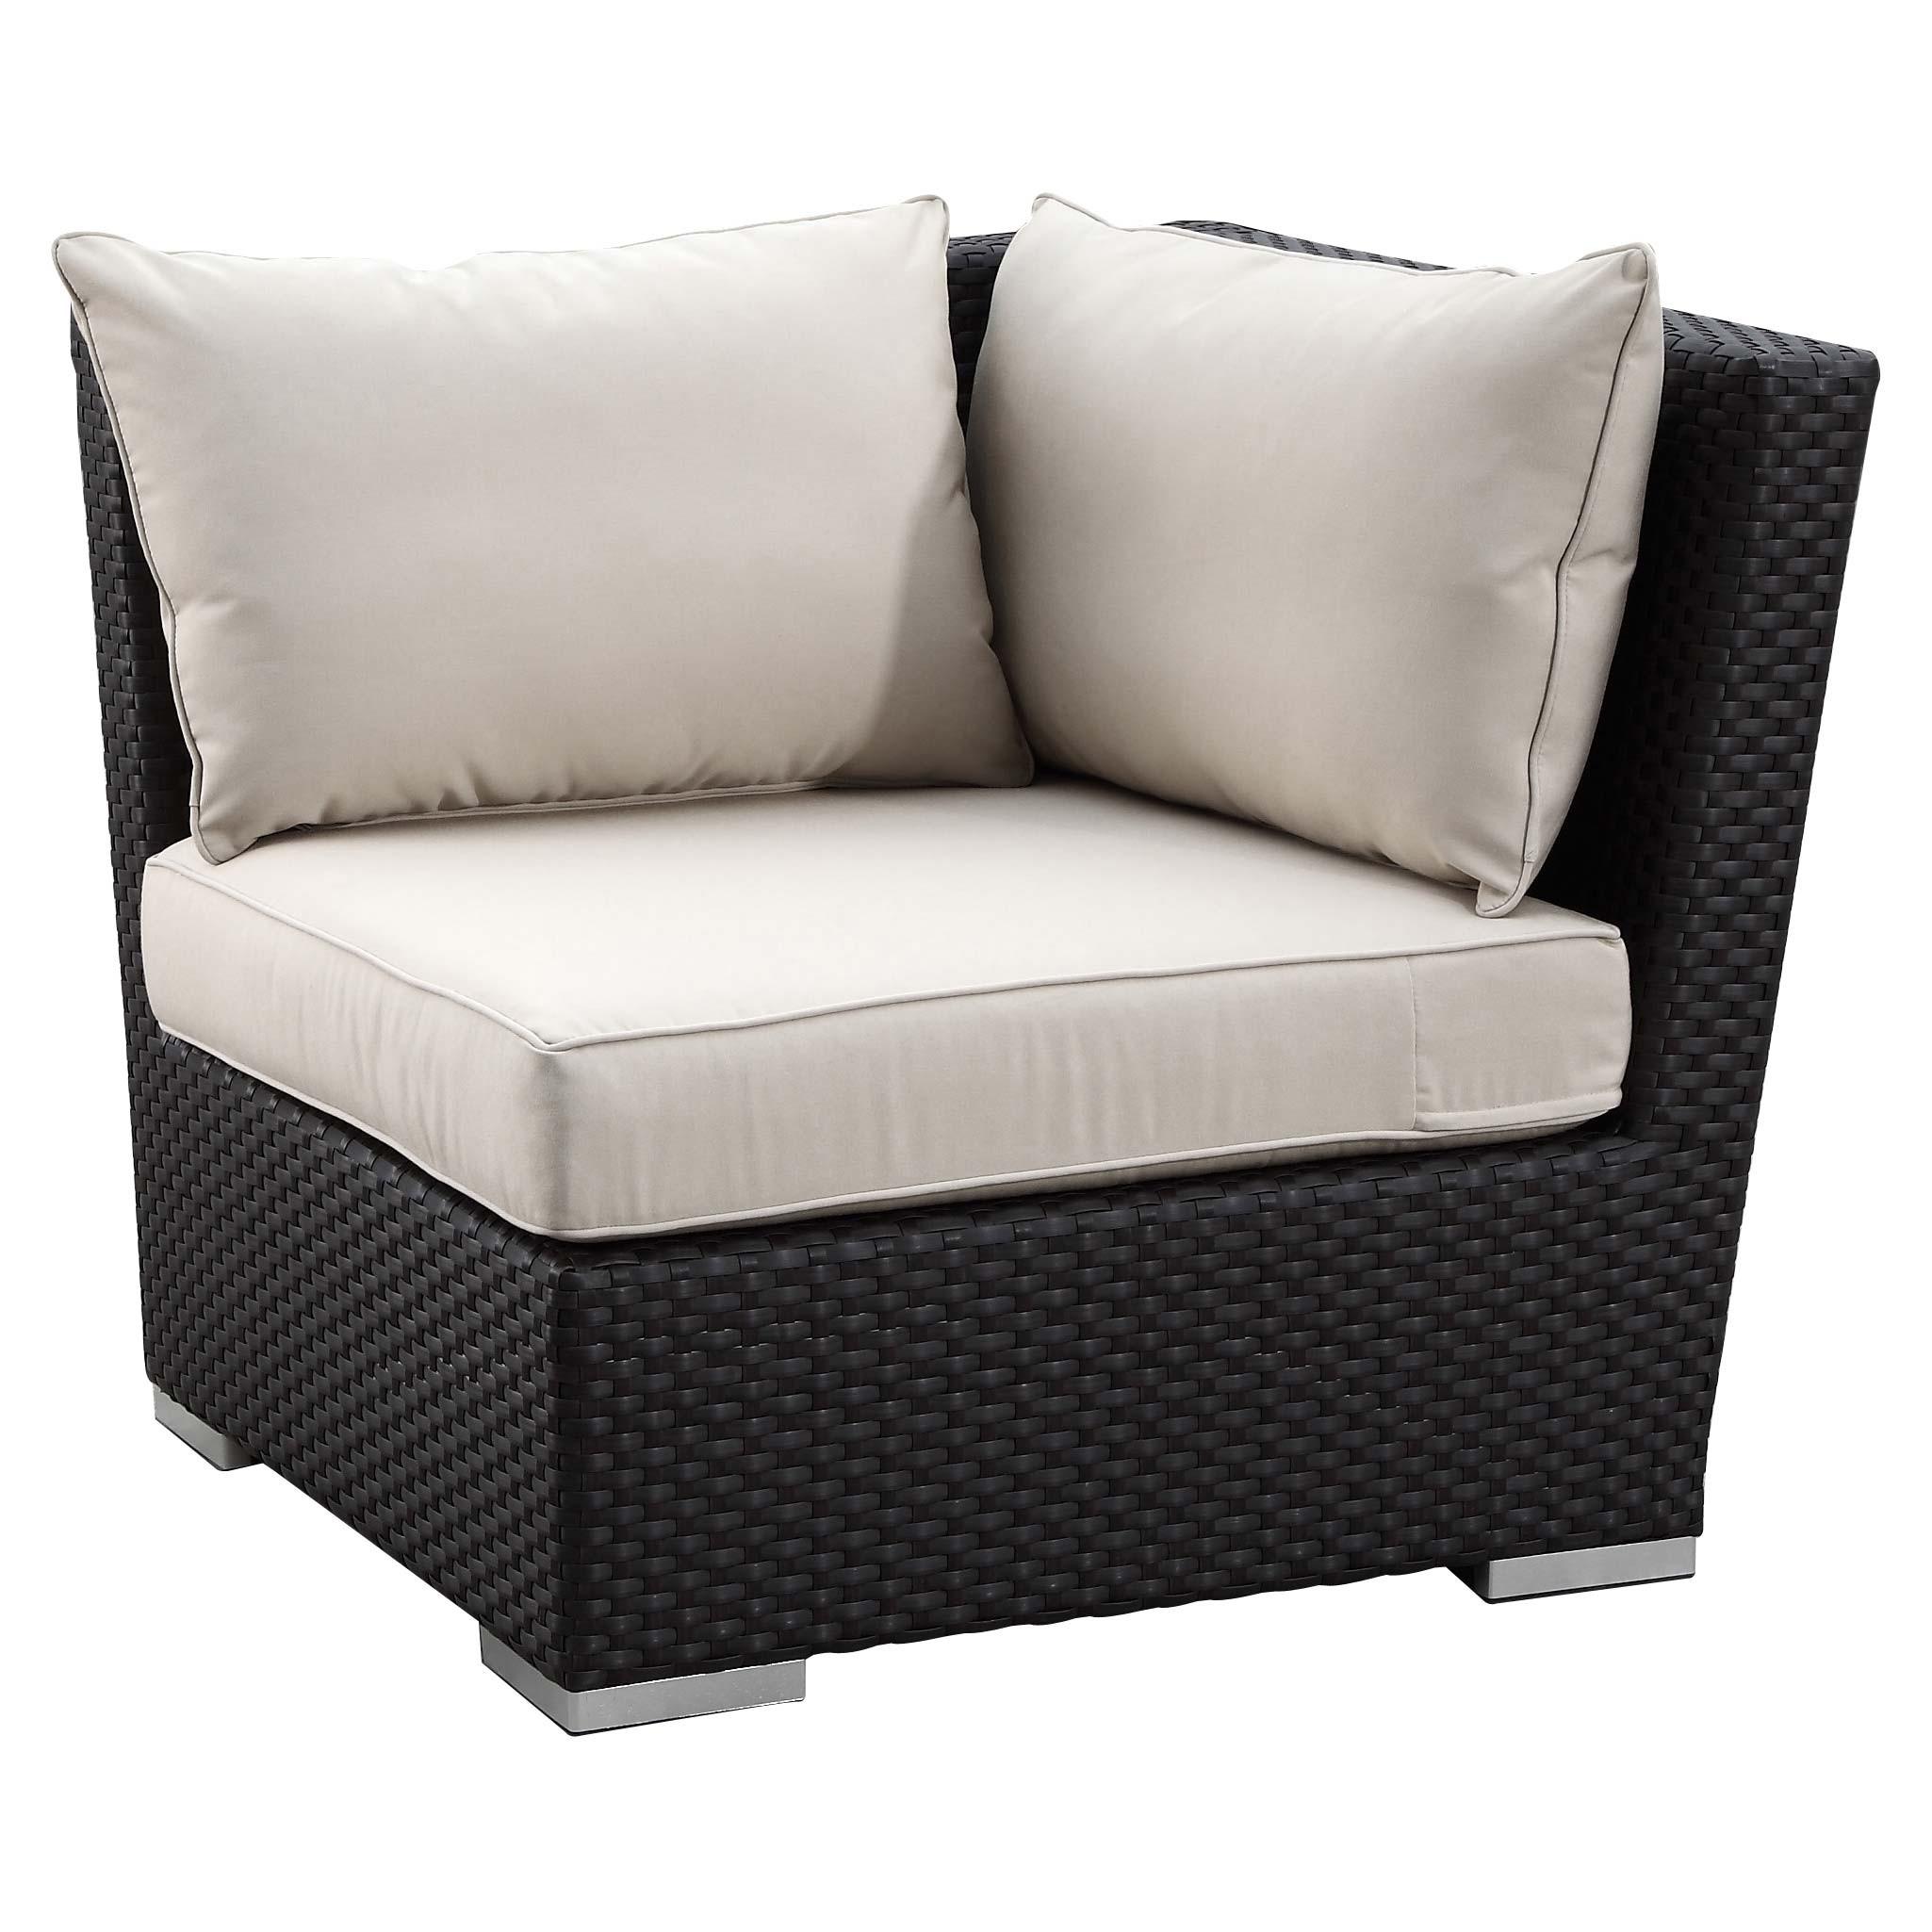 Sunset West Solana Wicker 5 Piece Sectional Sofa Set